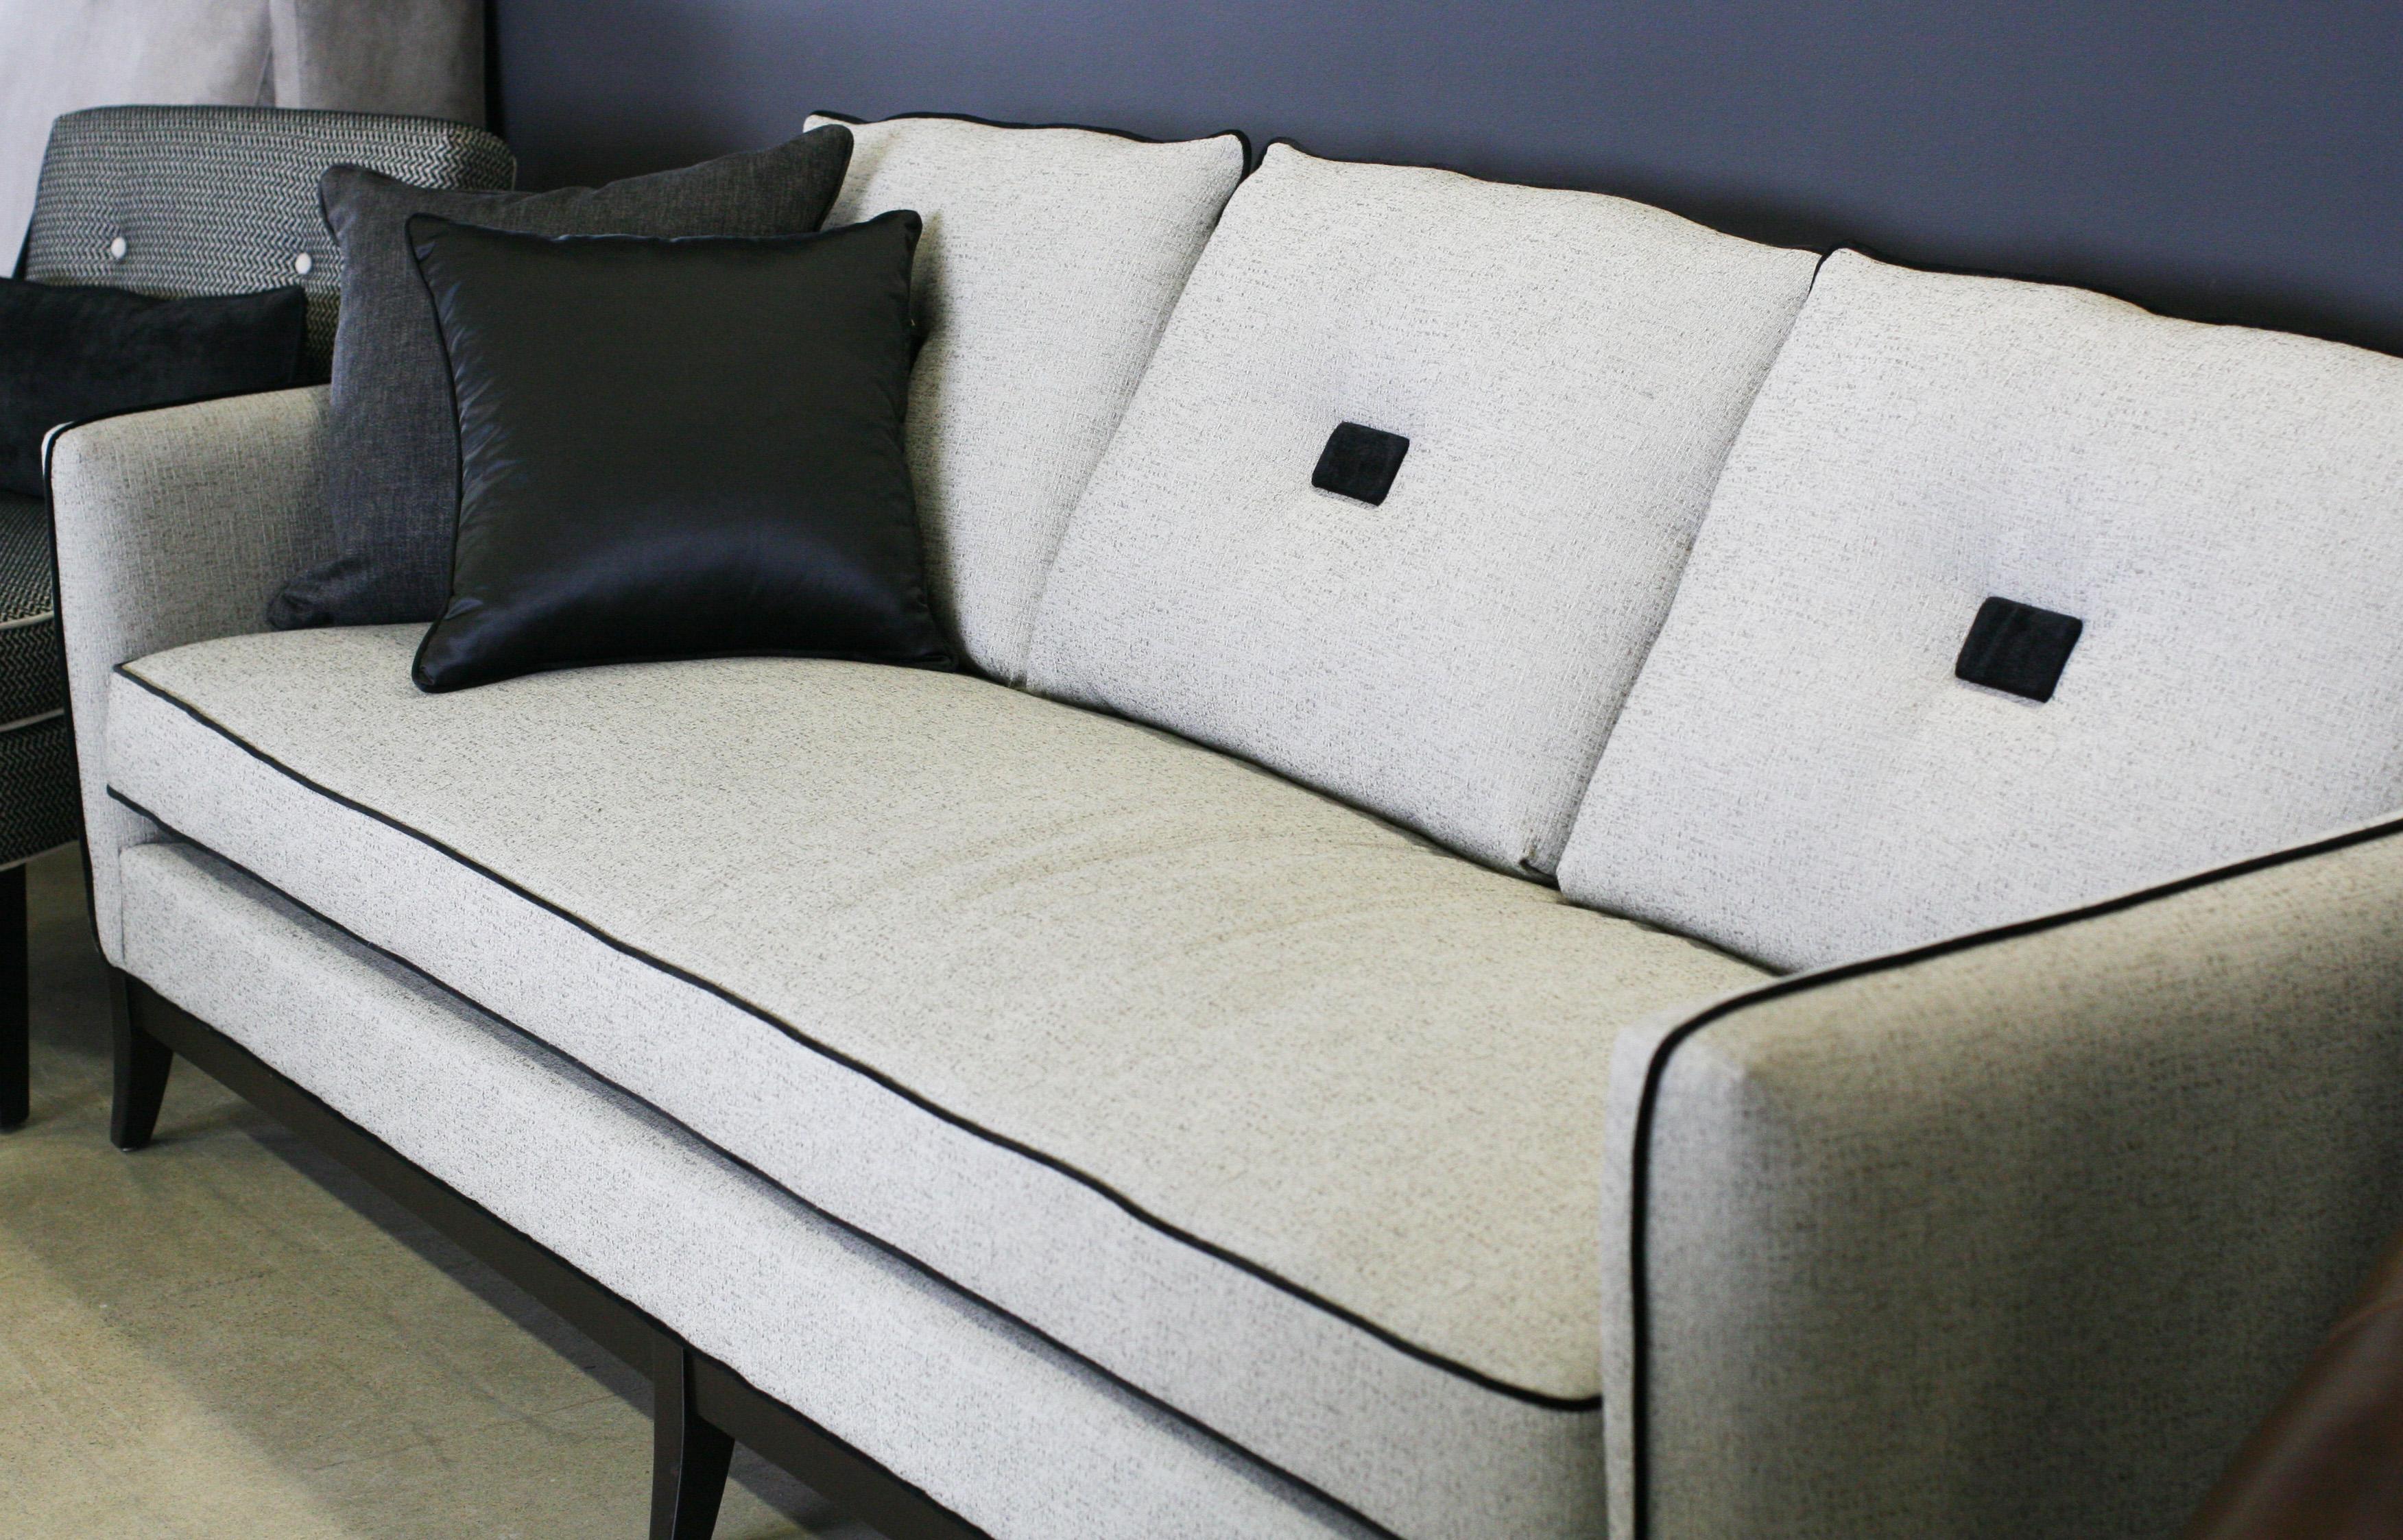 JL Sutherland sofa